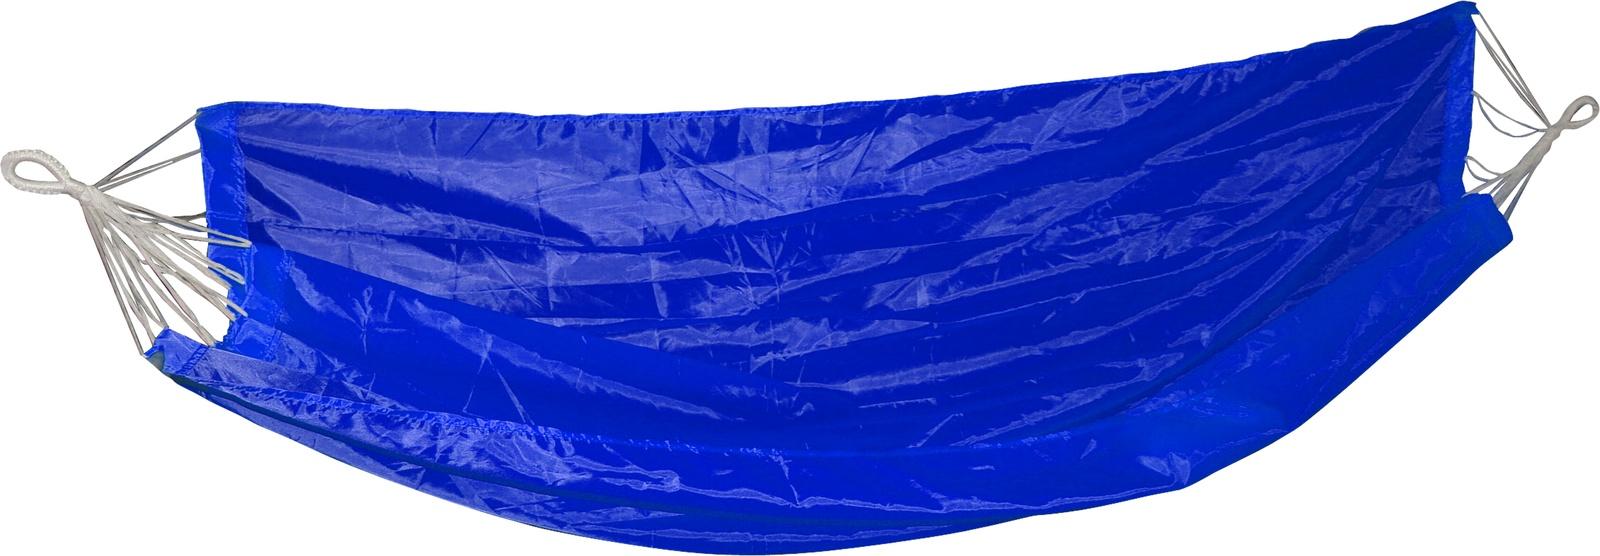 Гамак Ecos Ham-05T, синий